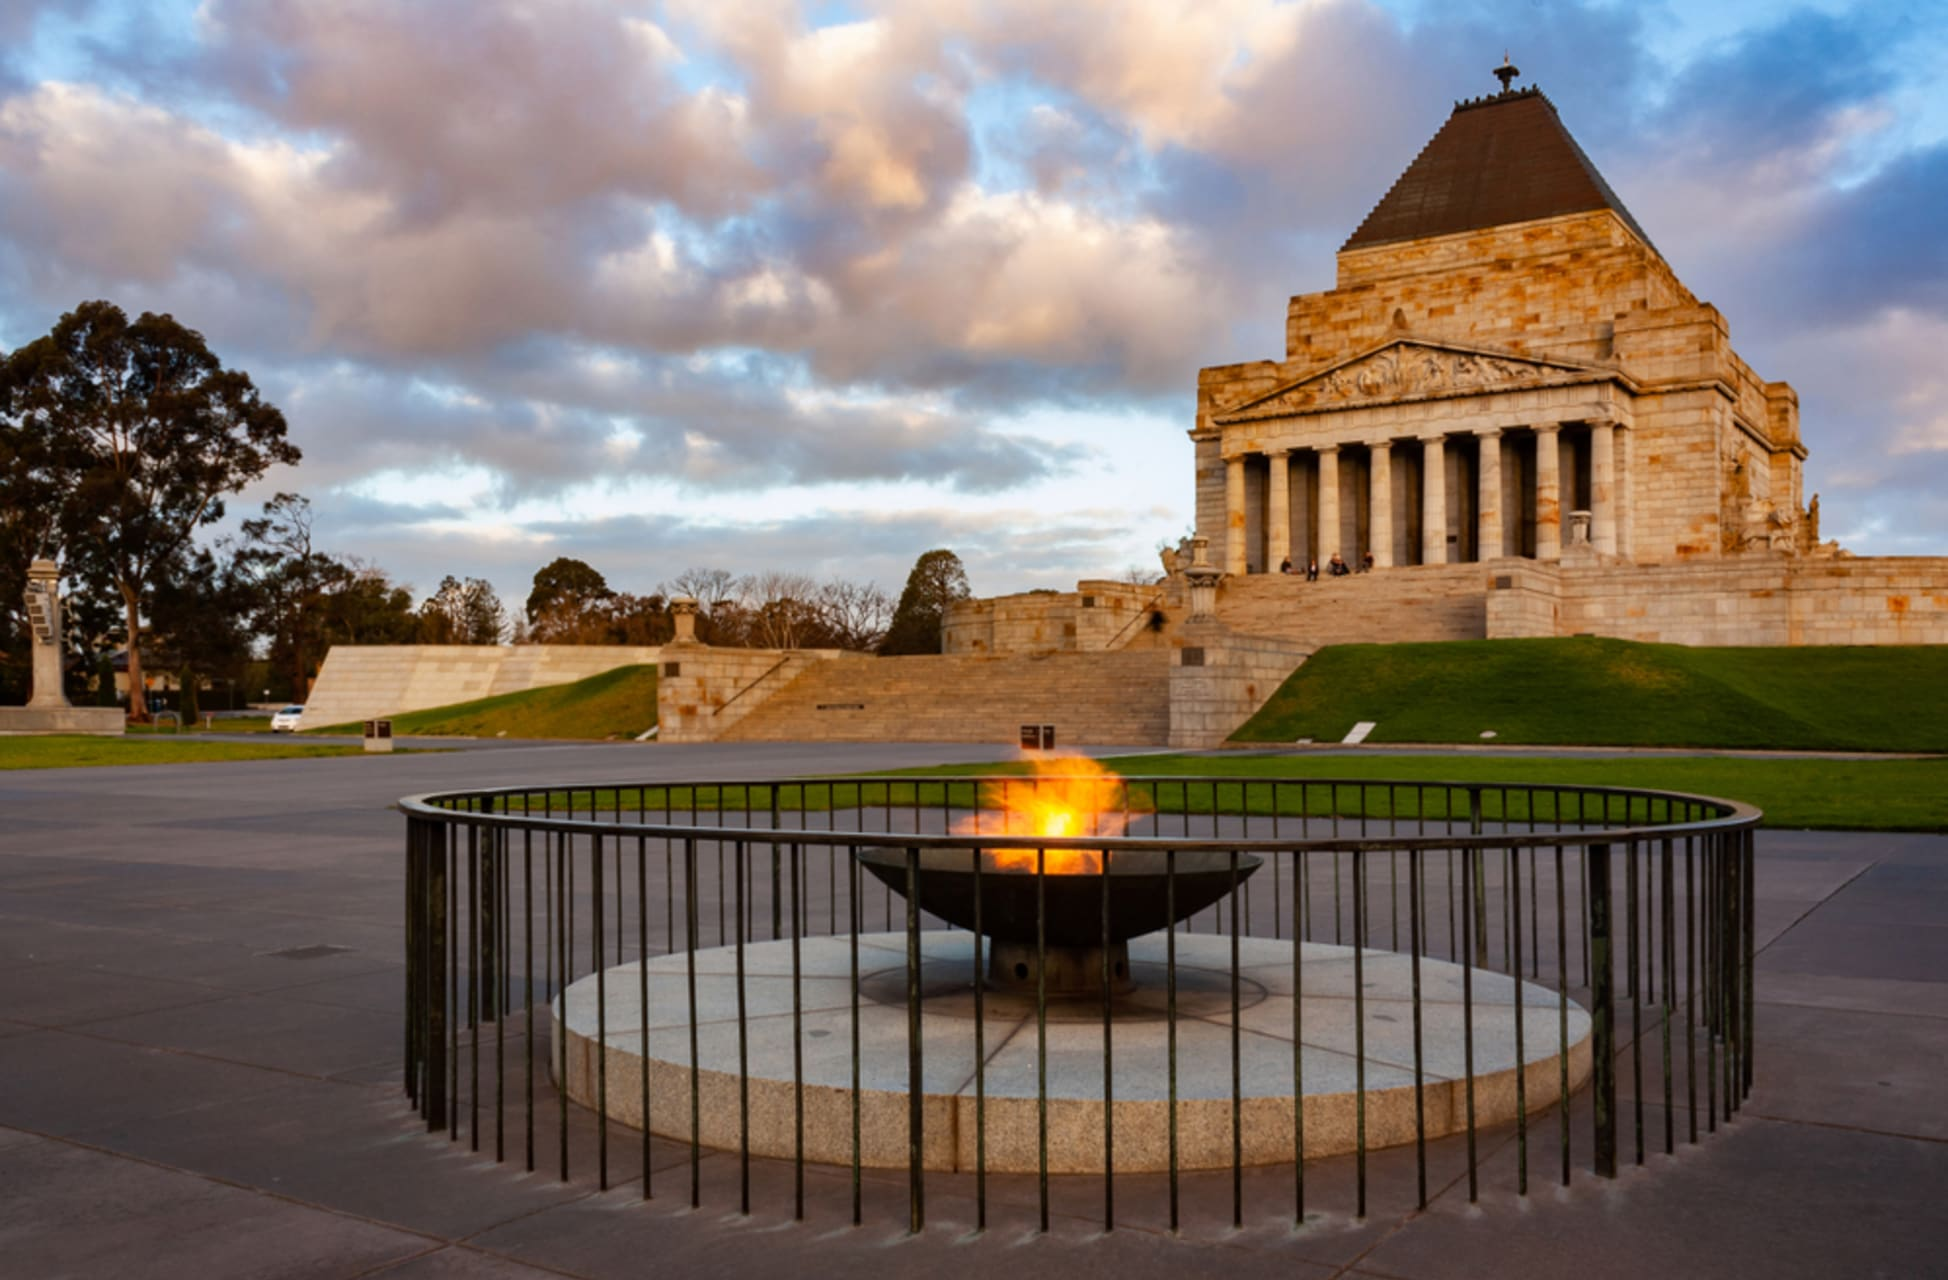 Melbourne - The Shrine and The Gardens